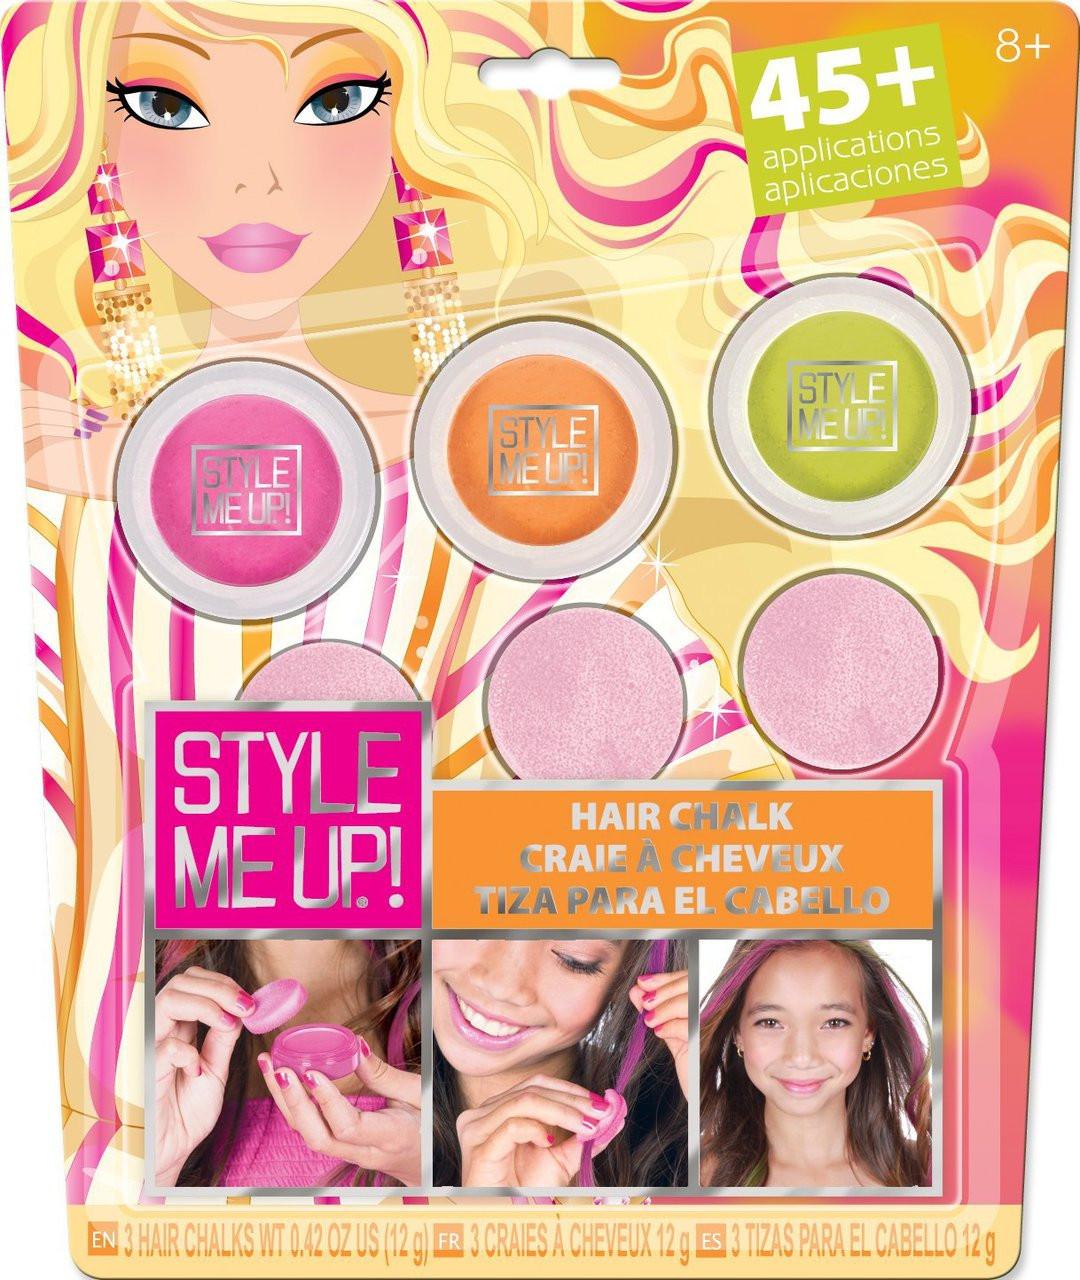 http://store-svx5q.mybigcommerce.com/product_images/web/628845016286.jpg